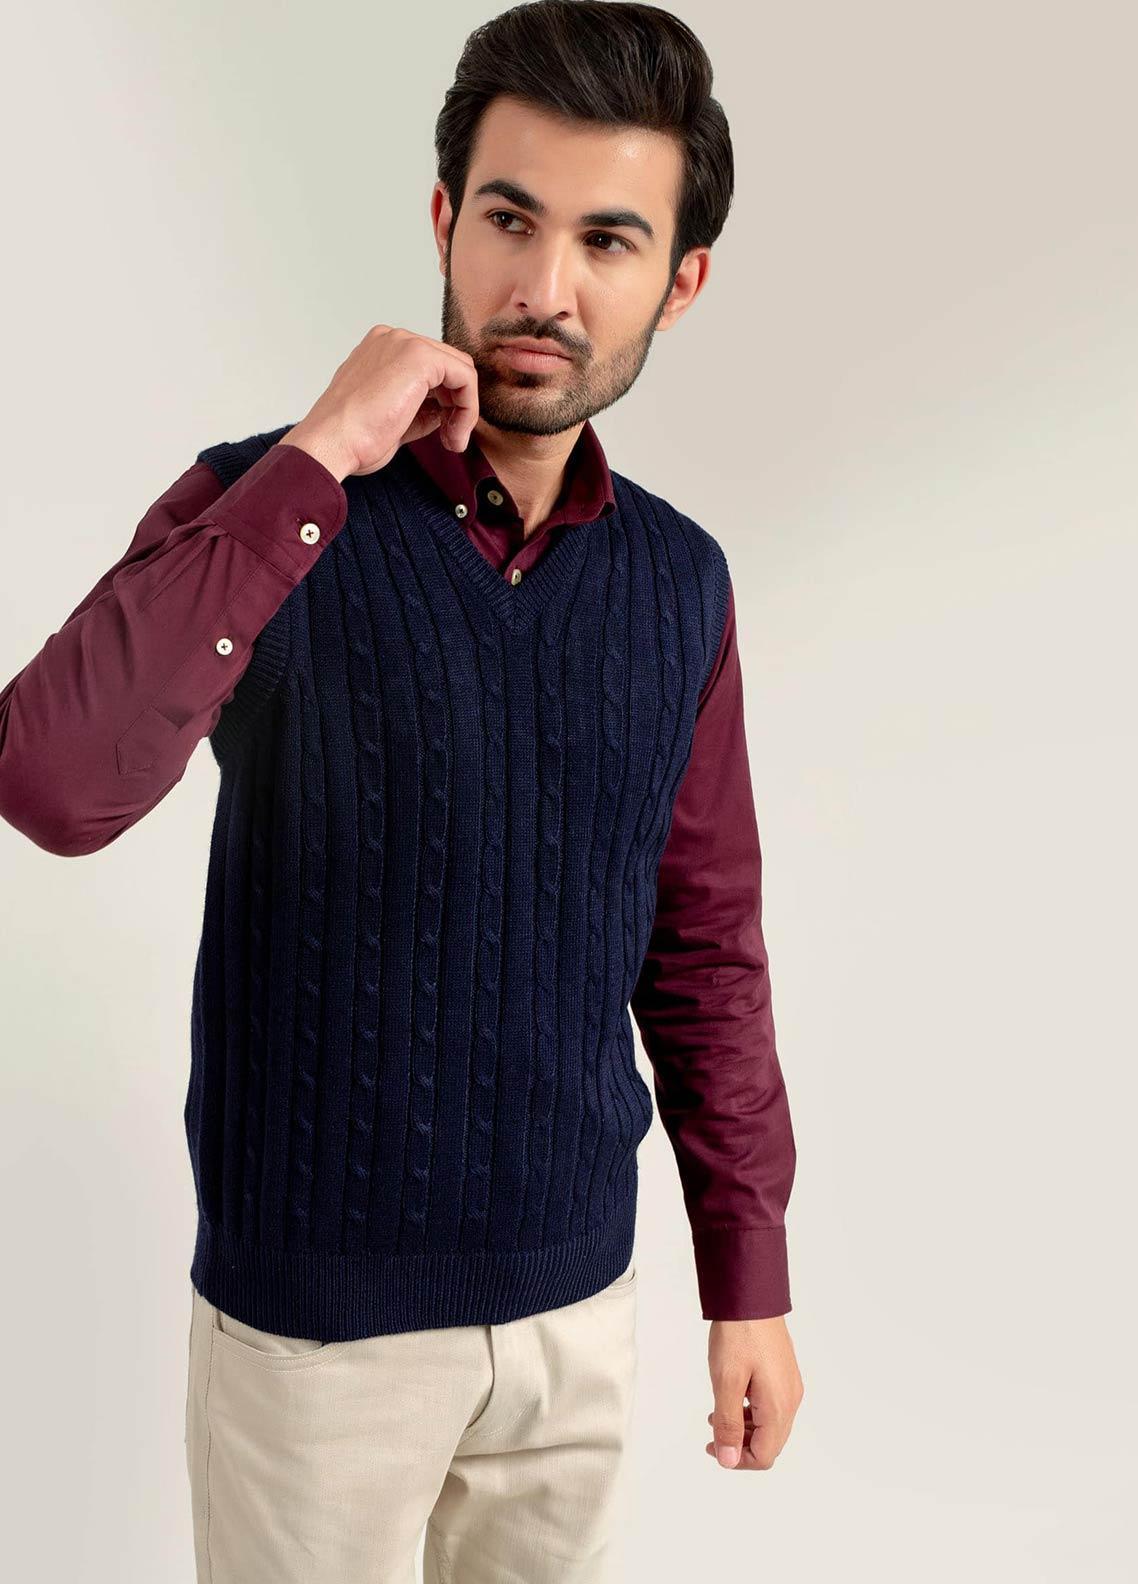 Brumano Acrylic Sleeveless Men Sweaters -  BM20WS Navy Blue Sleeveless Cable Knitted Sweater